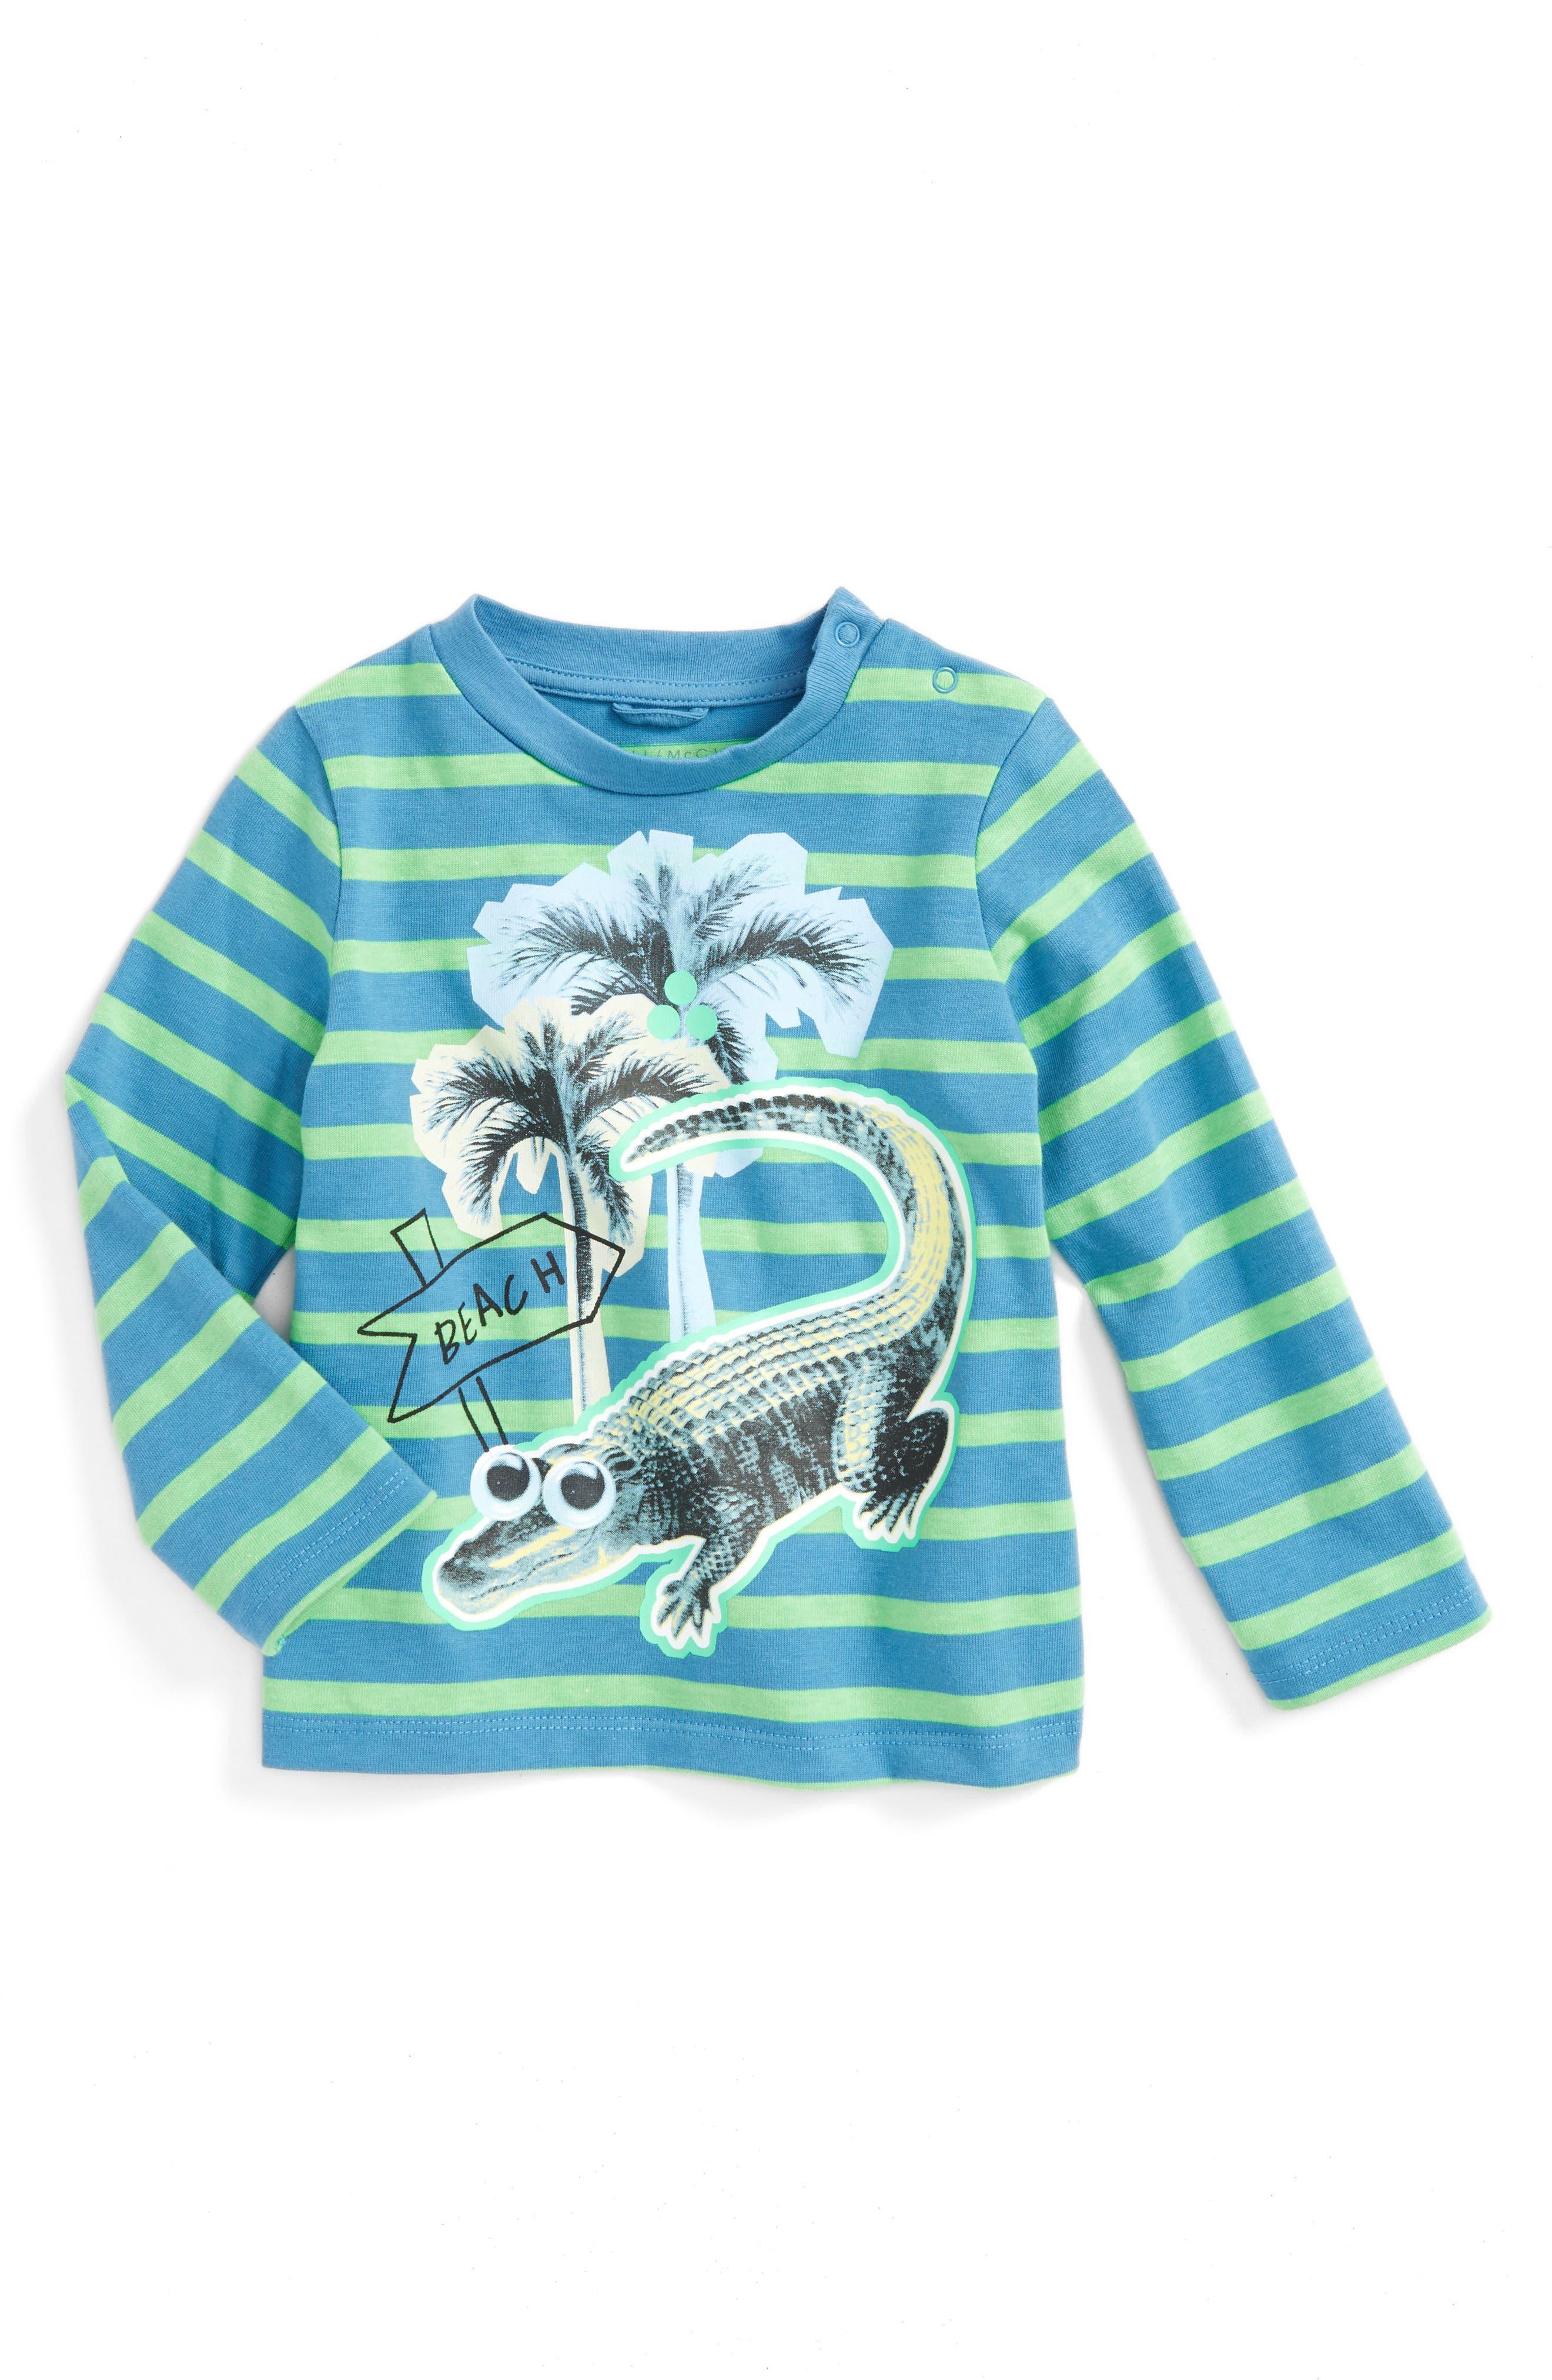 Stella McCartney Kids Alligator T-Shirt (Baby)